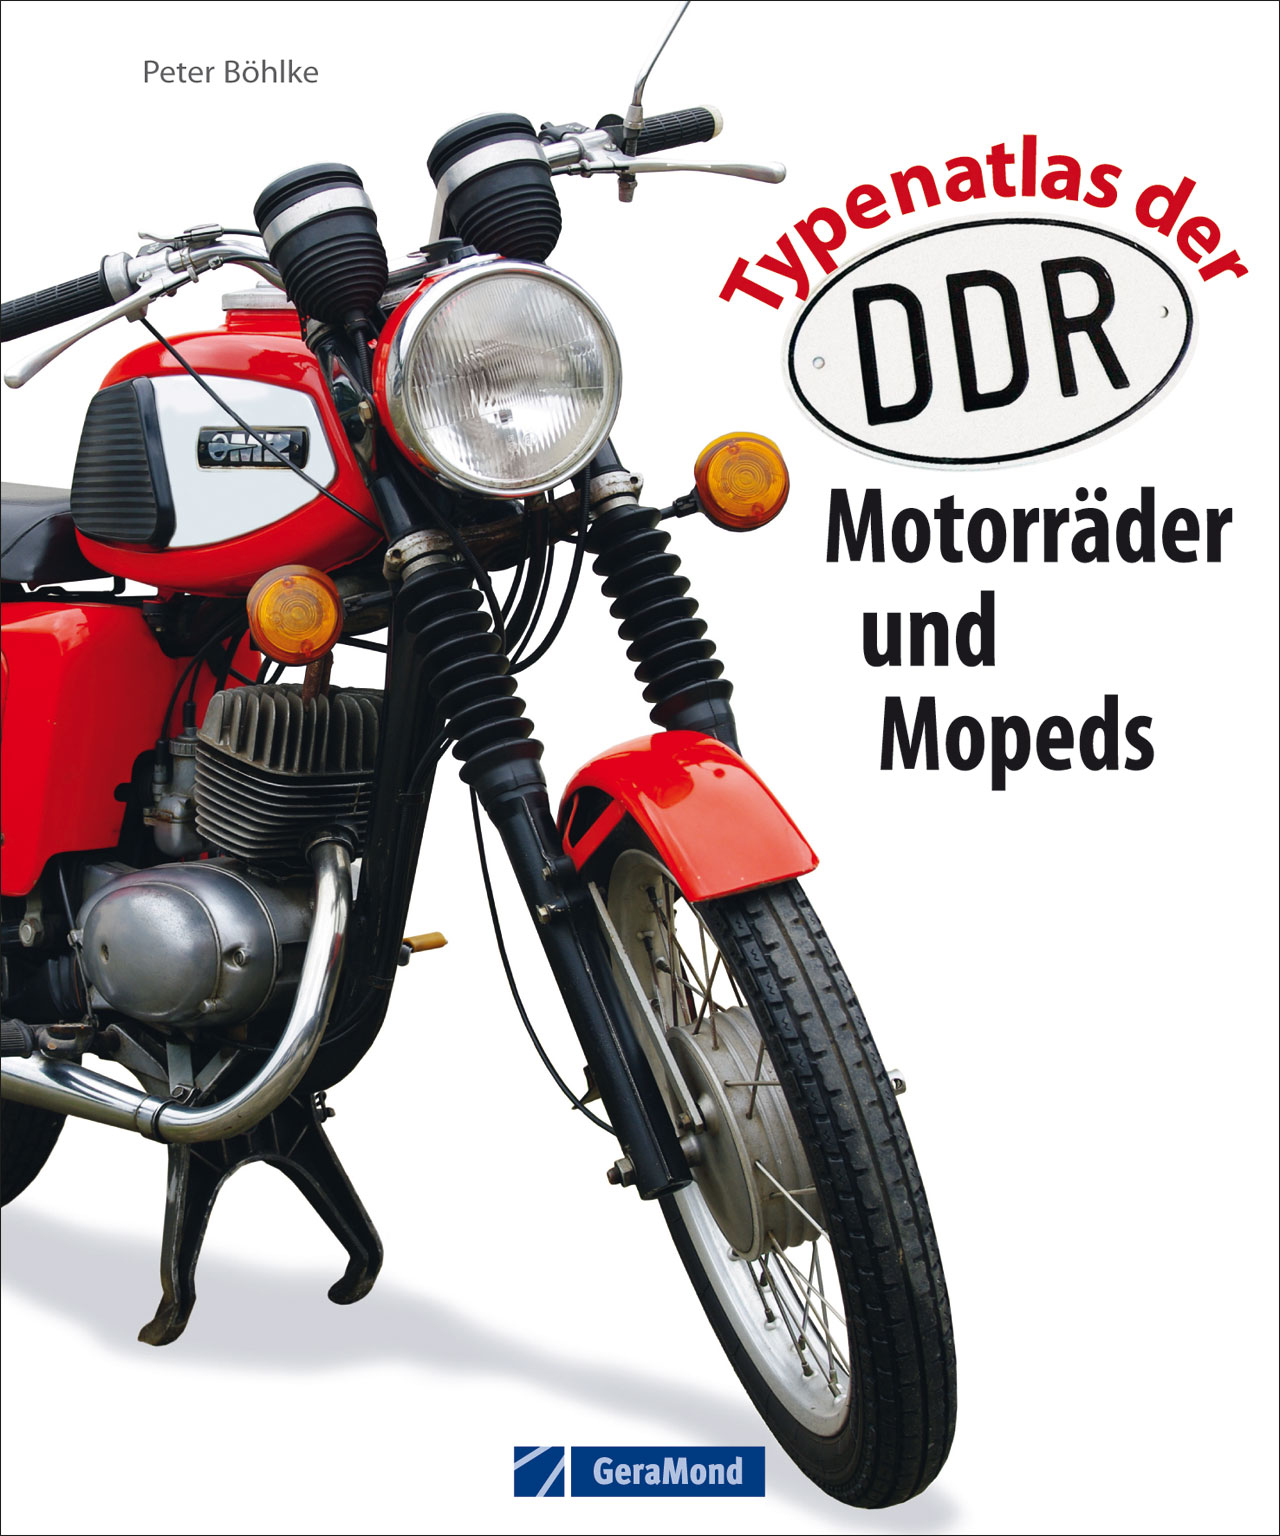 Typenatlas der DDR-Motorräder und Mopeds - Peter Böhlke